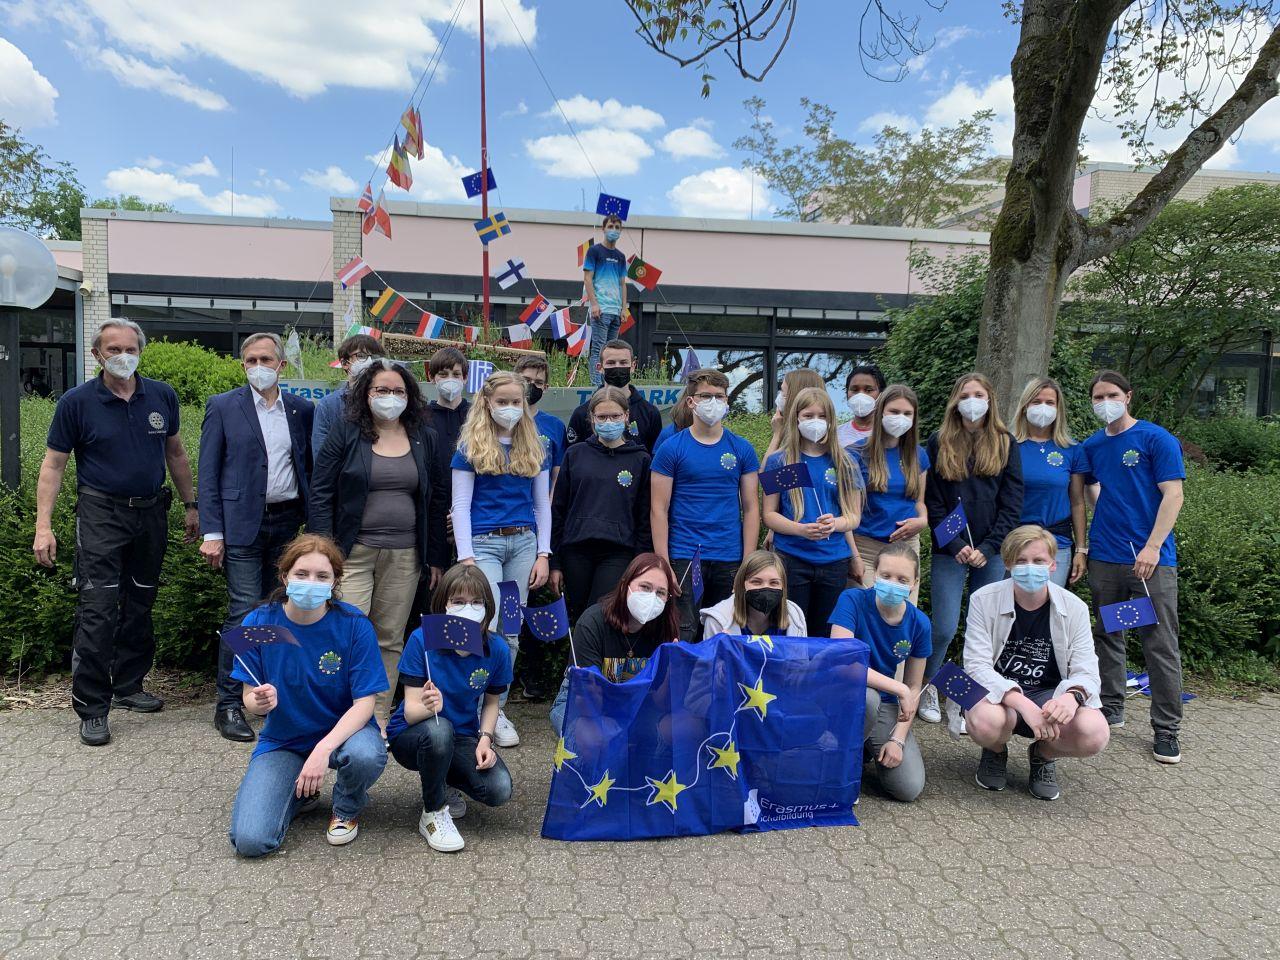 Erlebtes Europa: Erster Virtueller Schüleraustausch am NGK mit fast 80 TeilnehmerInnen